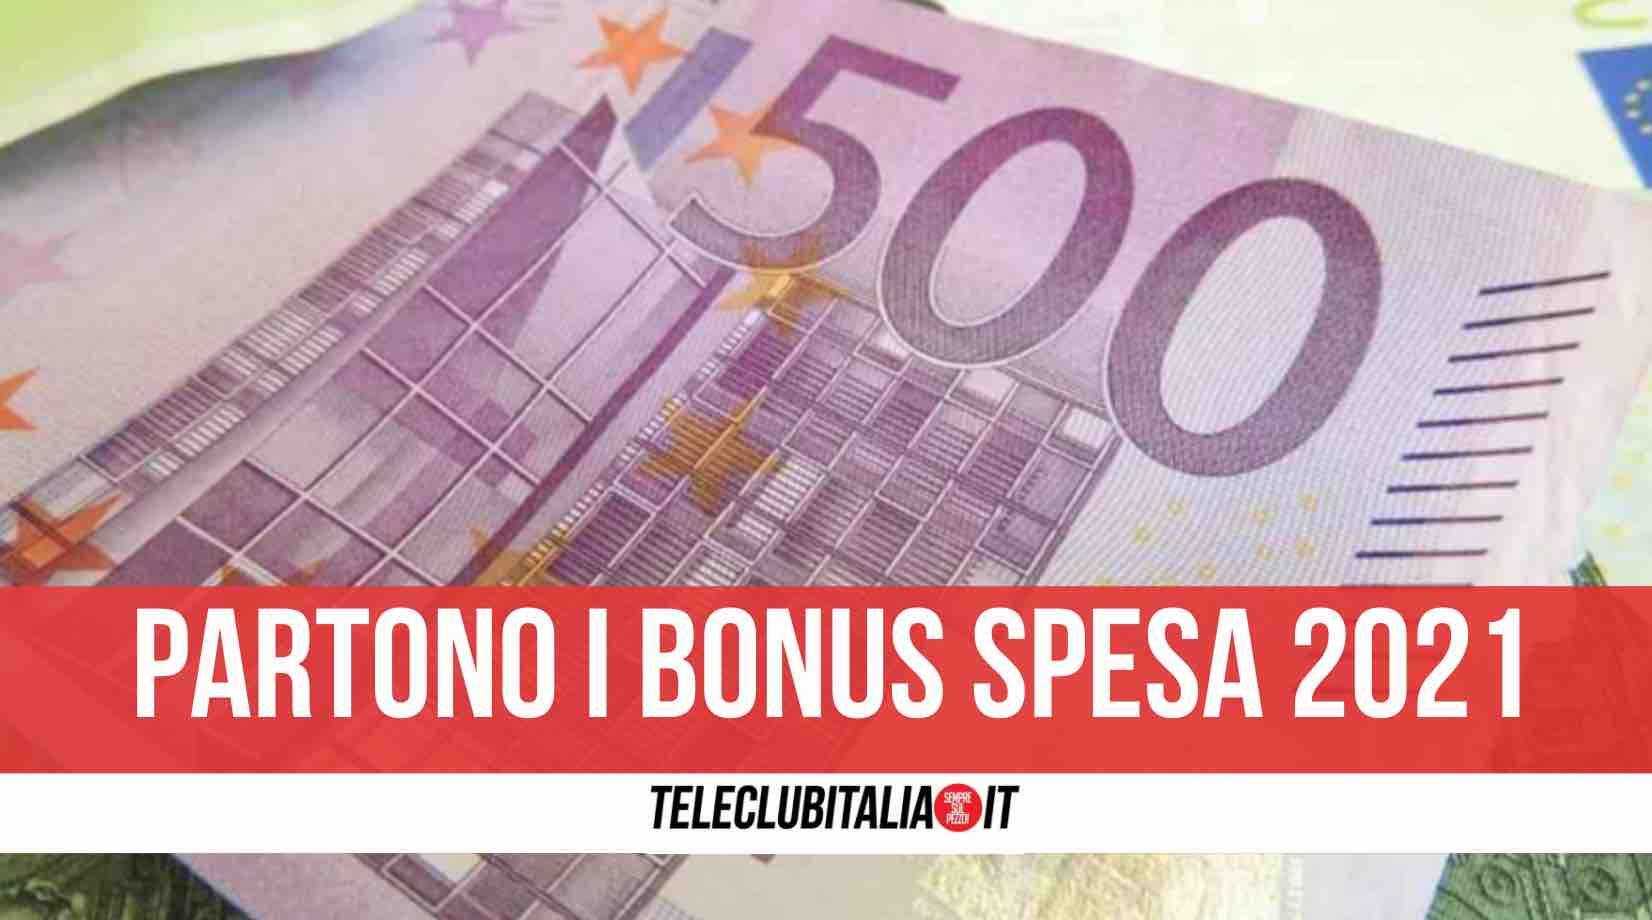 bonus spesa 2021 500 euro